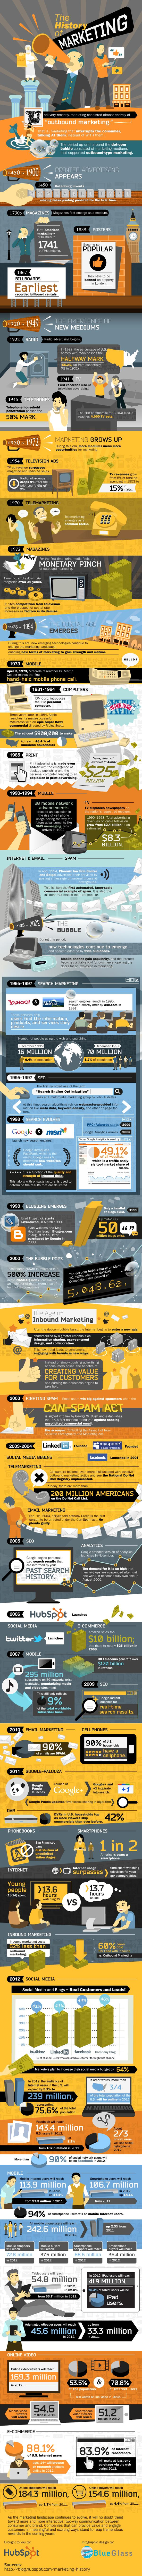 the history of marketing HUBSPOT resized 600.jpg